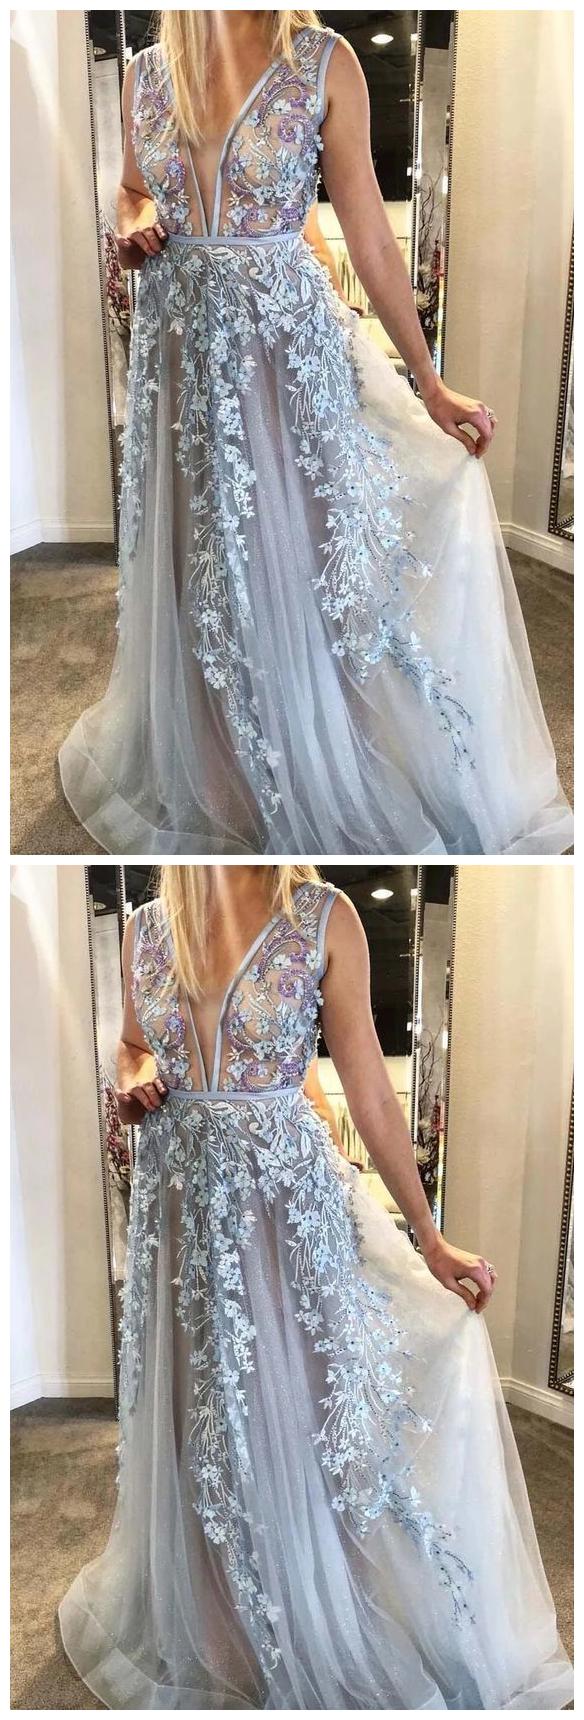 A-line Floral Appliques Long Prom Dress Plunging Neckline Formal Gown